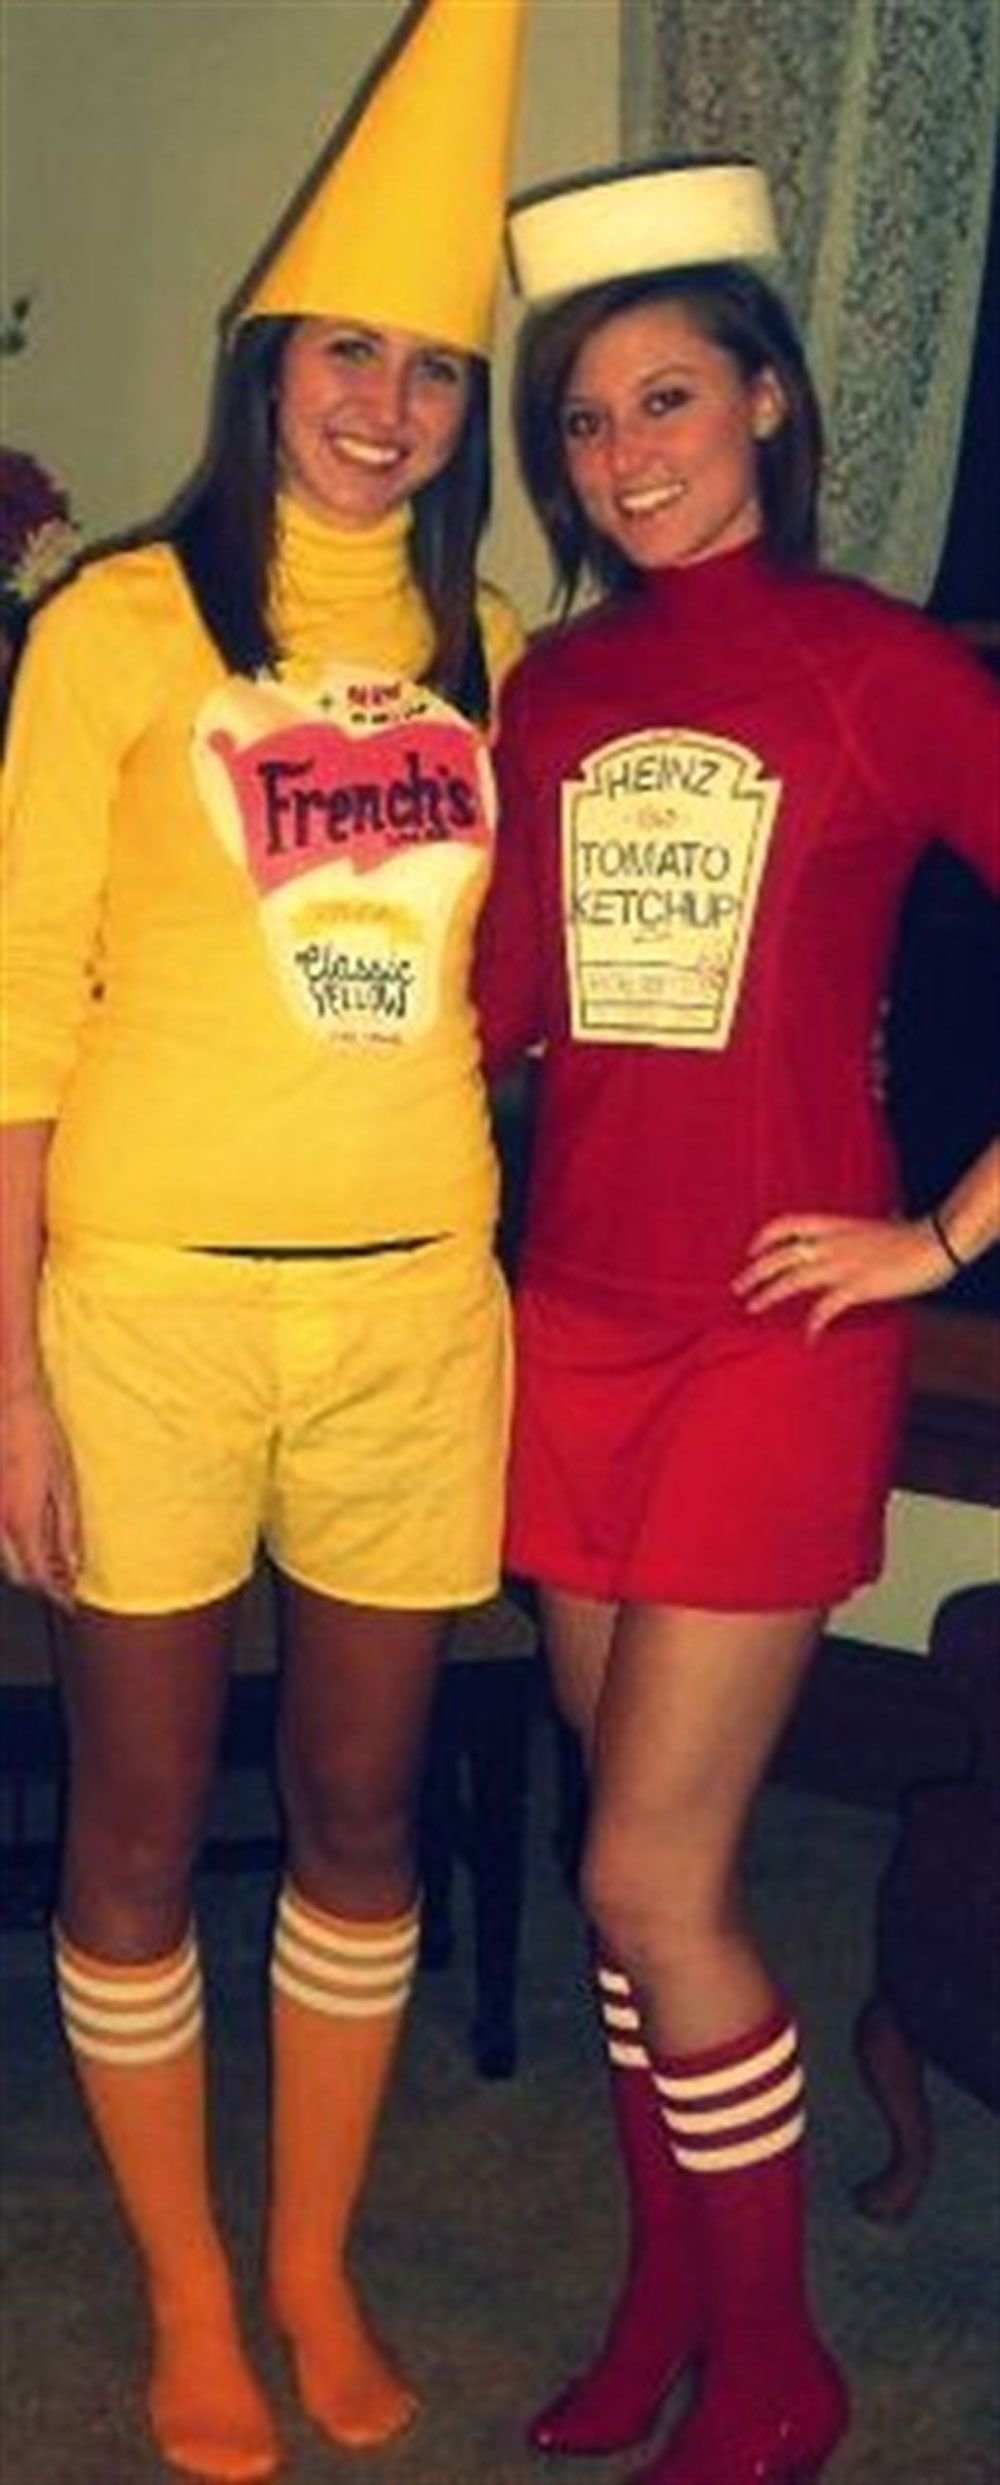 10 nice best friend halloween costume ideas 24 genius bff halloween costume ideas you need to